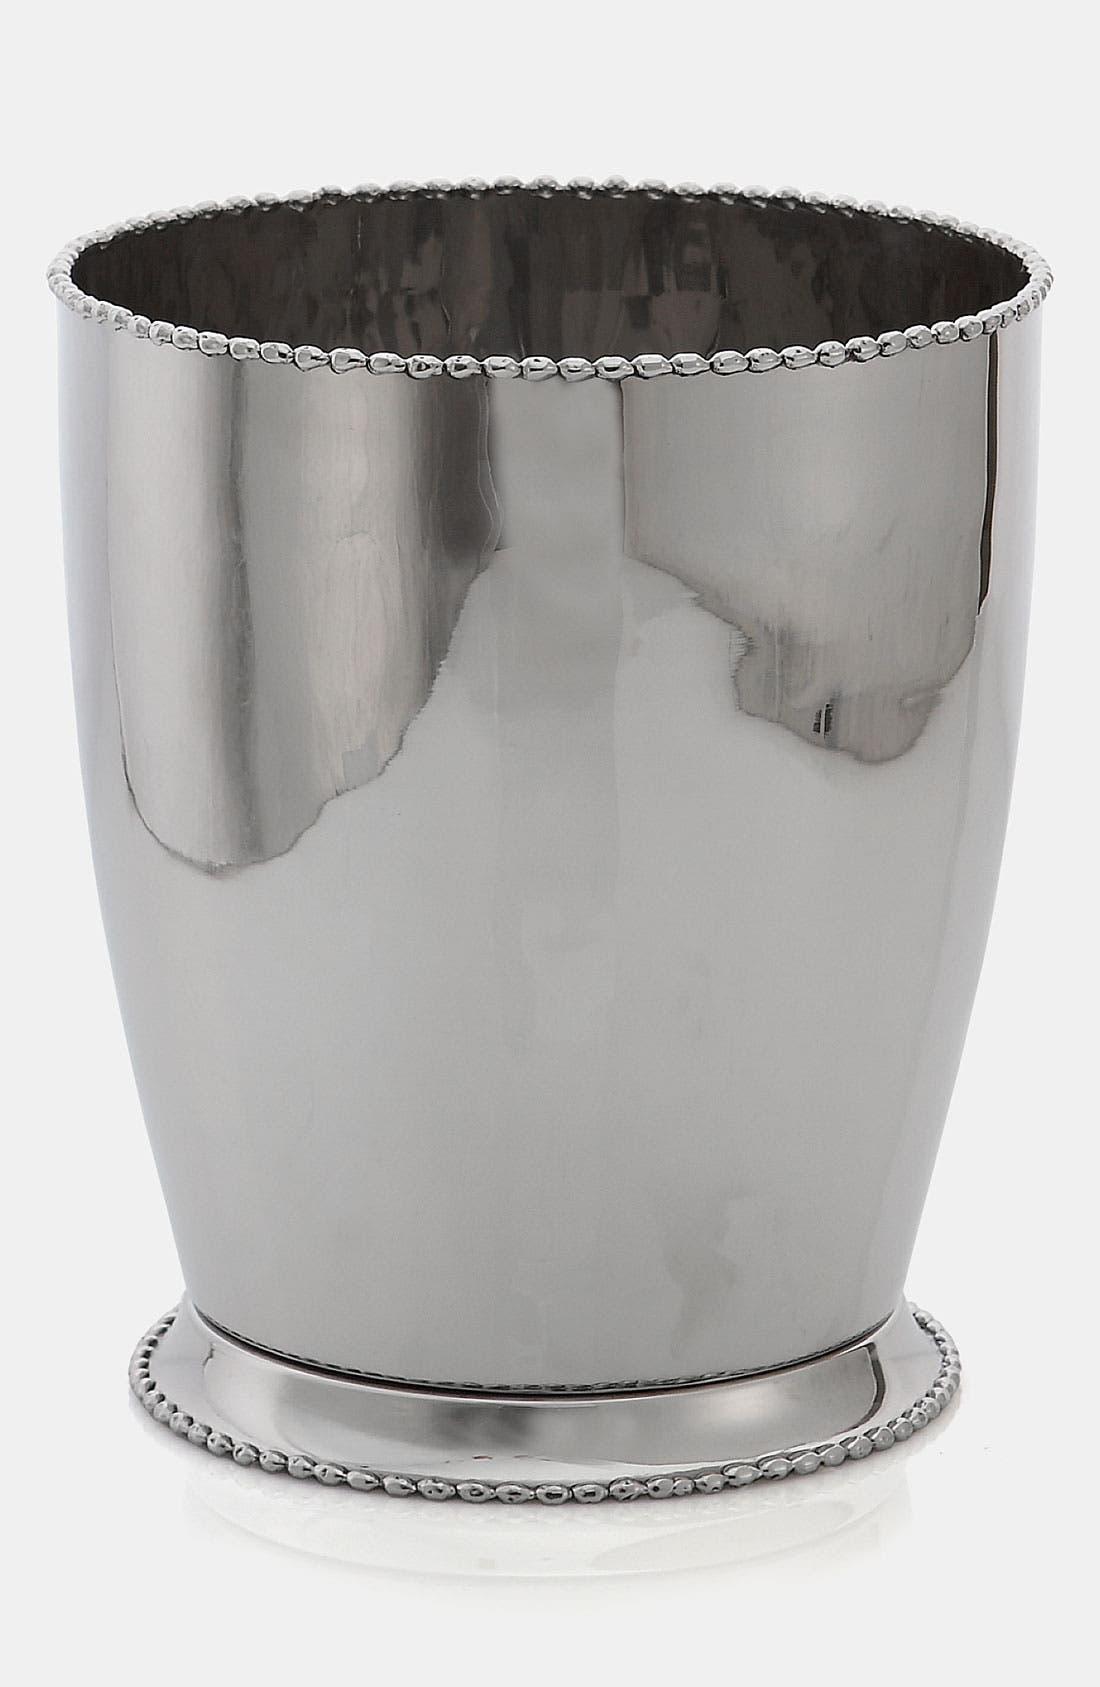 Main Image - Michael Aram 'New Molten' Wastebasket